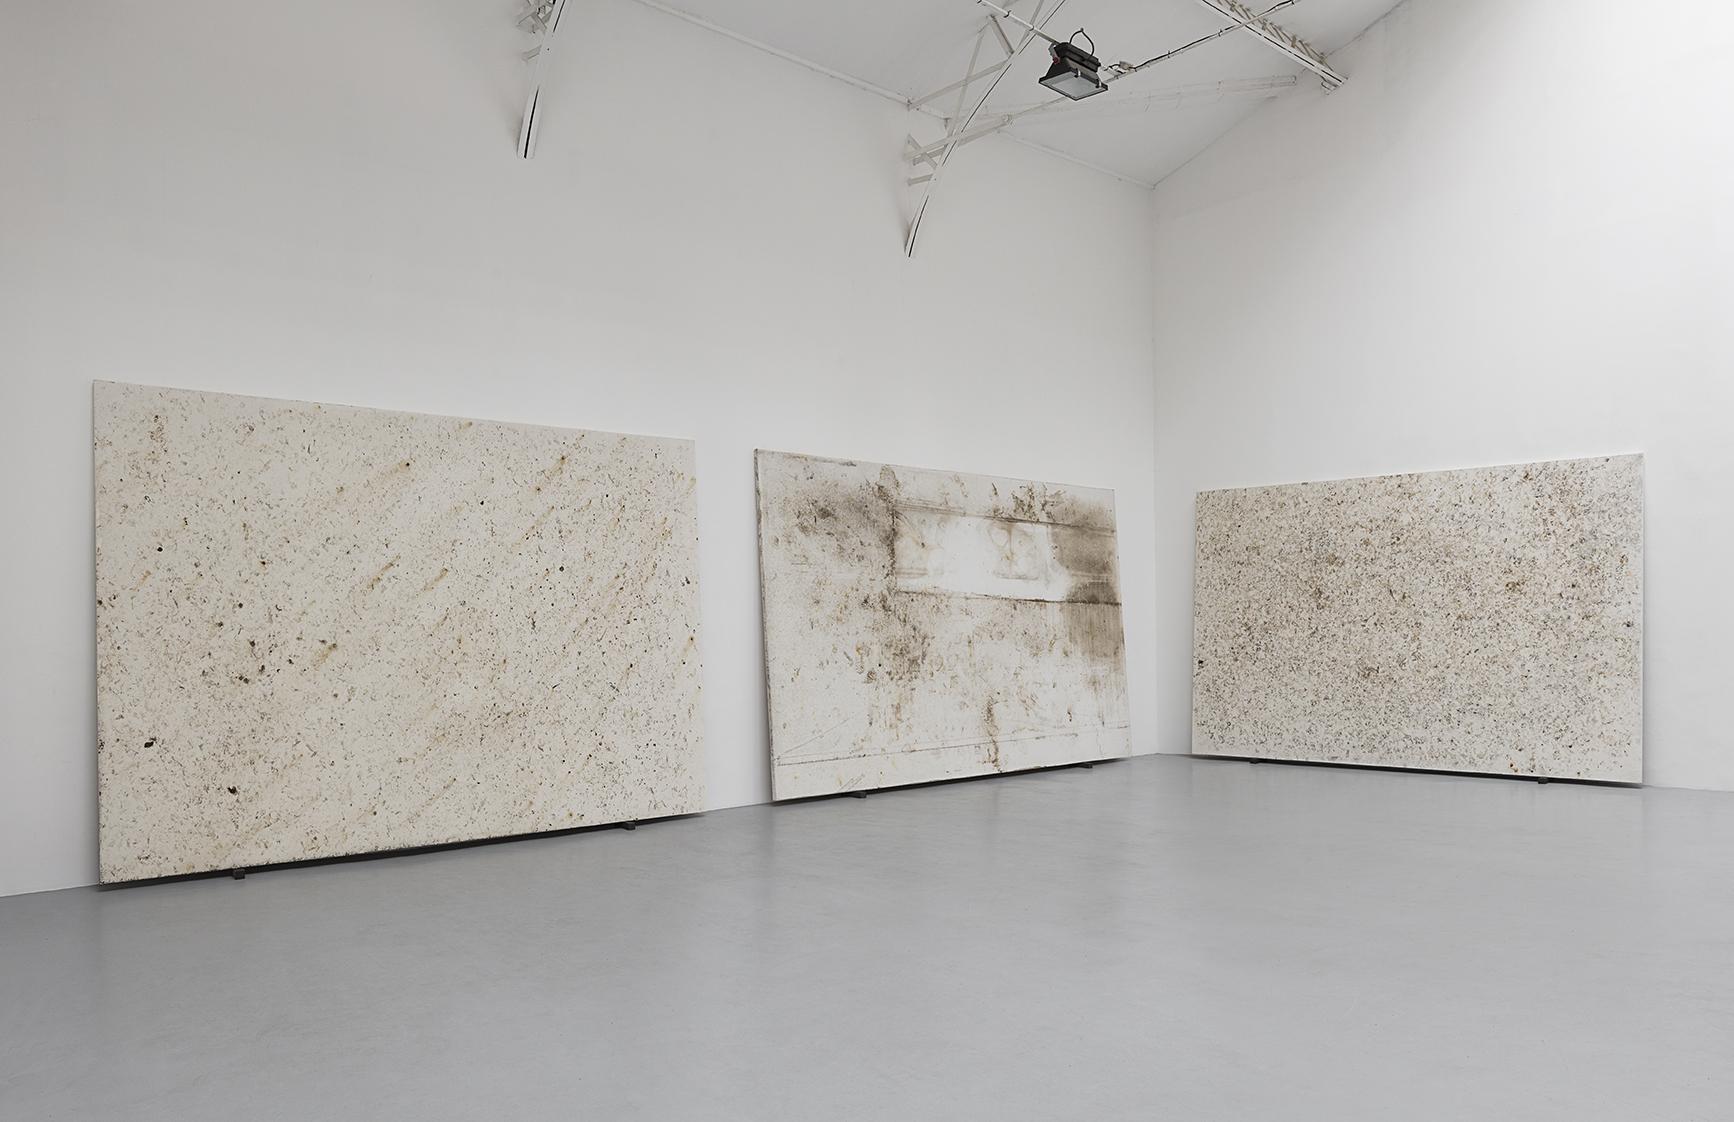 Karin Sander Haus am Waldsee Garten / Patina Painting, 2018, Stretched canvas in standard size, white universal primer, 300 x 500 cm.   Vue d'installation, Hussenot, Paris. — Galerie Éric Hussenot, Paris